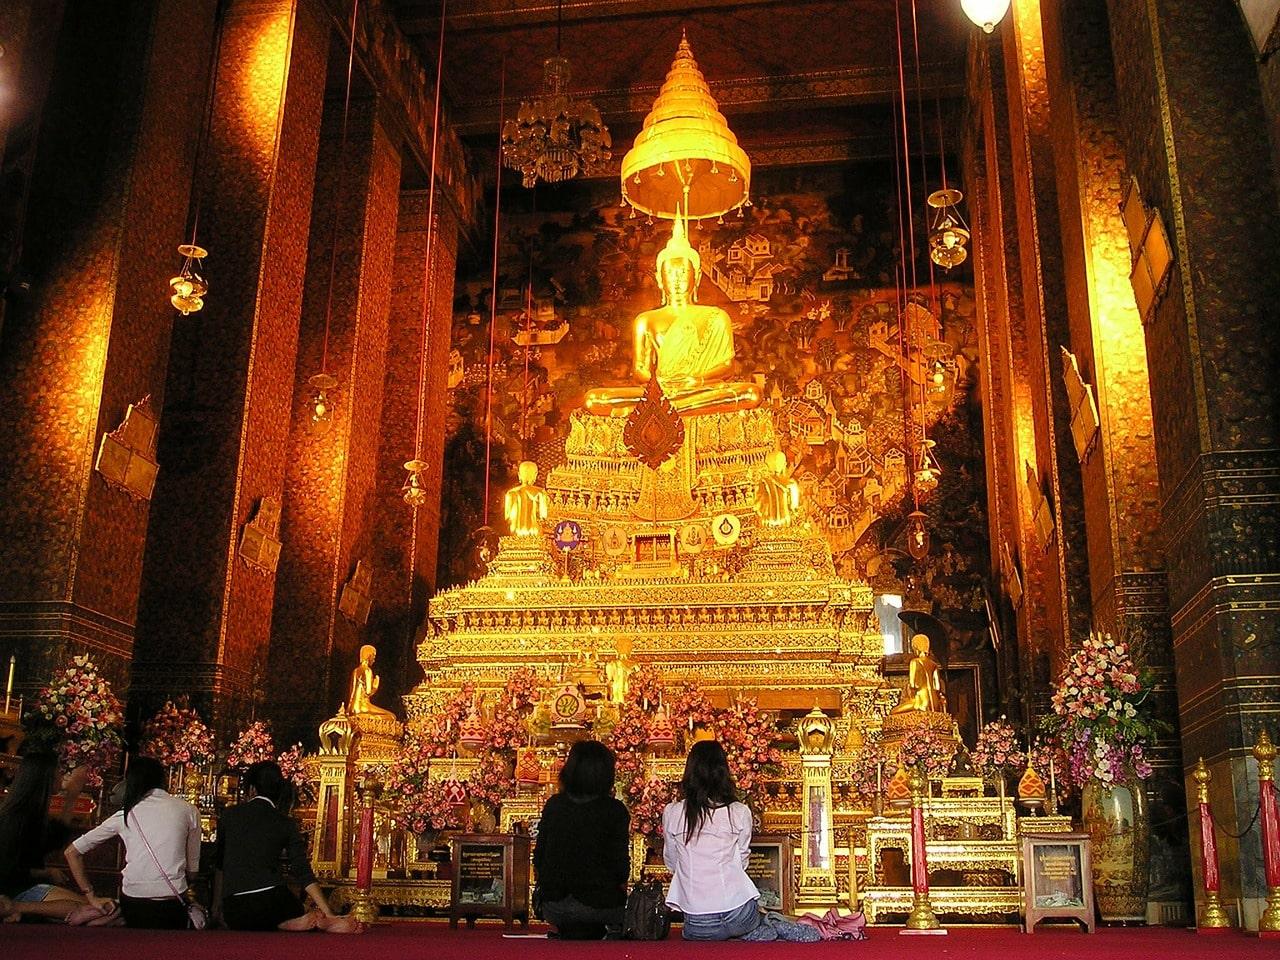 Full-day Bangkok City Tour from Laem Chabang Port 6